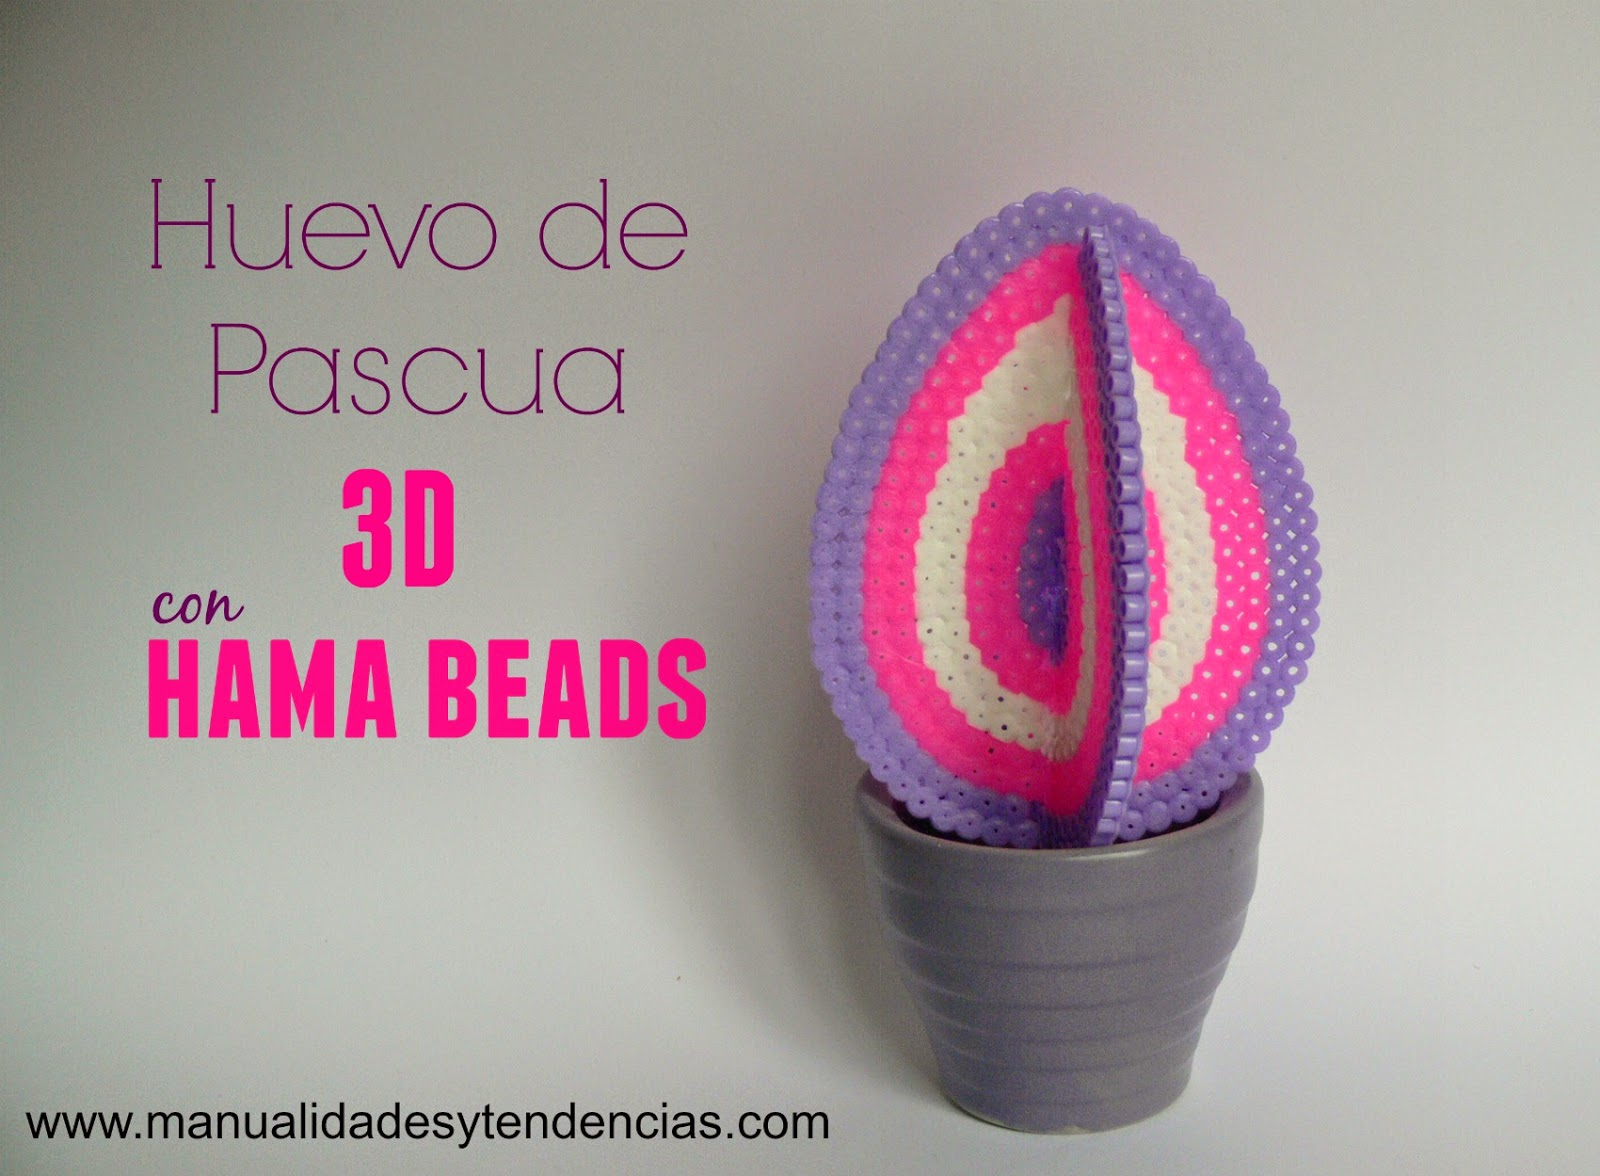 Huevo de Pascua 3D con hama beads